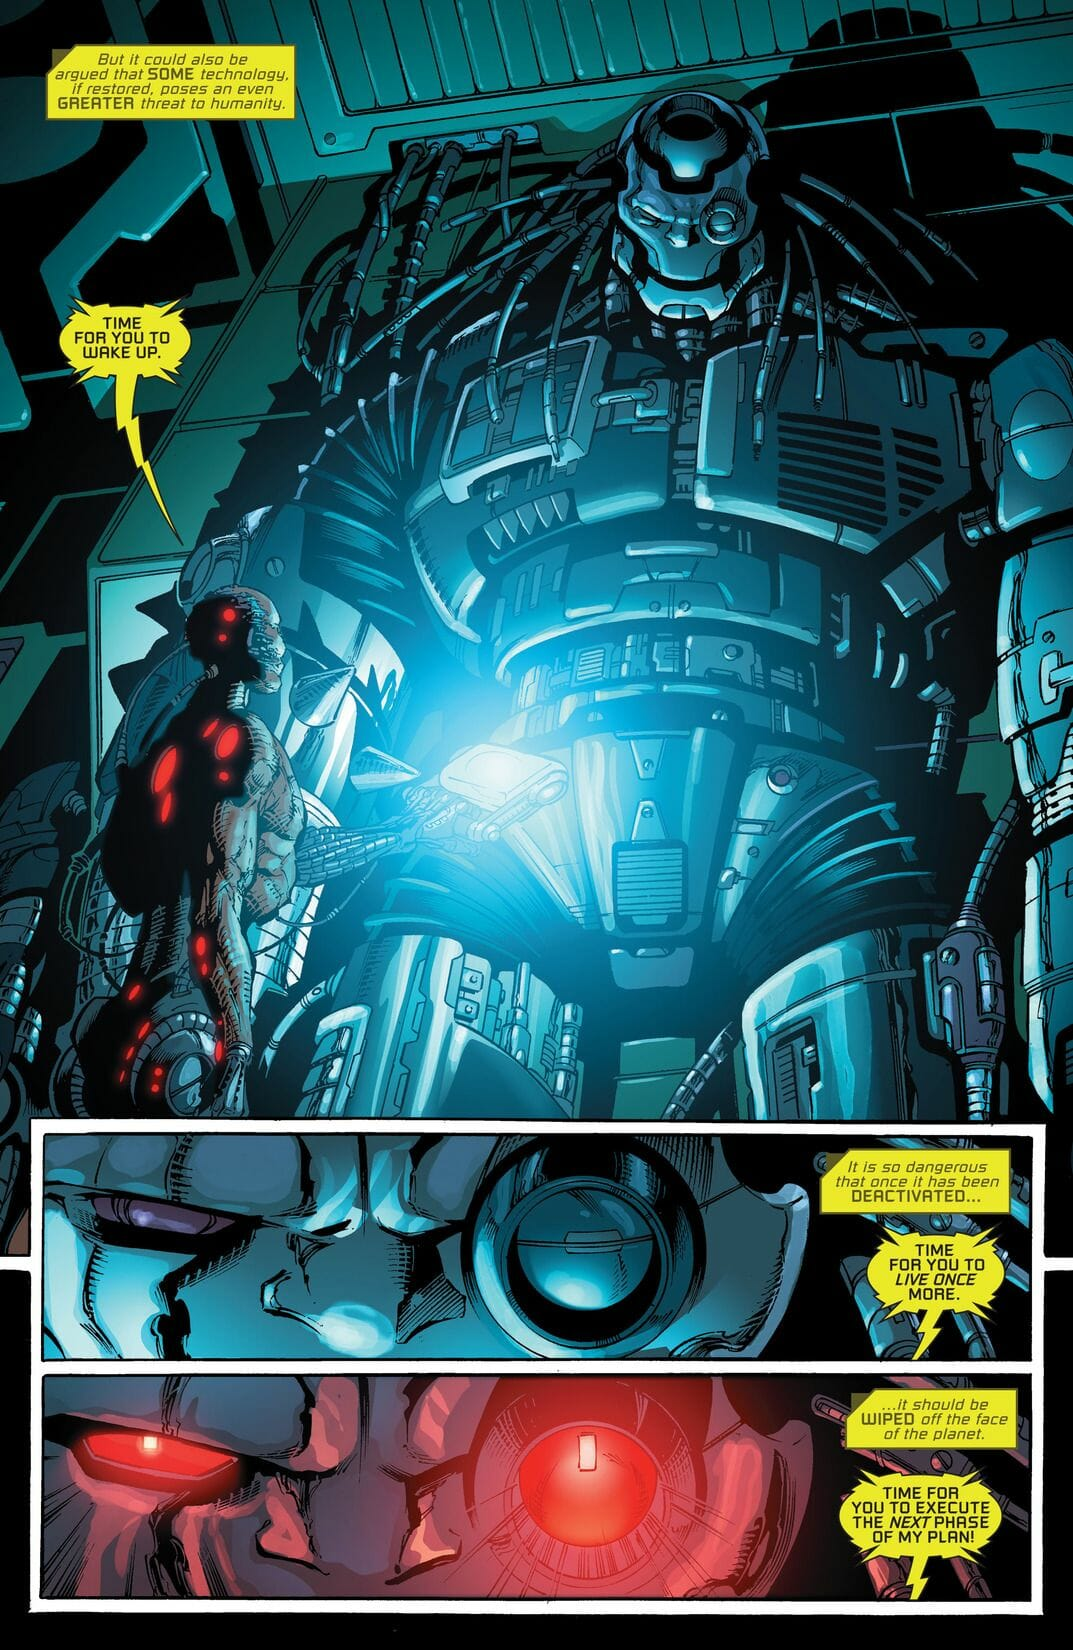 Cyborg Rebirth #1 (Comic) Review 2